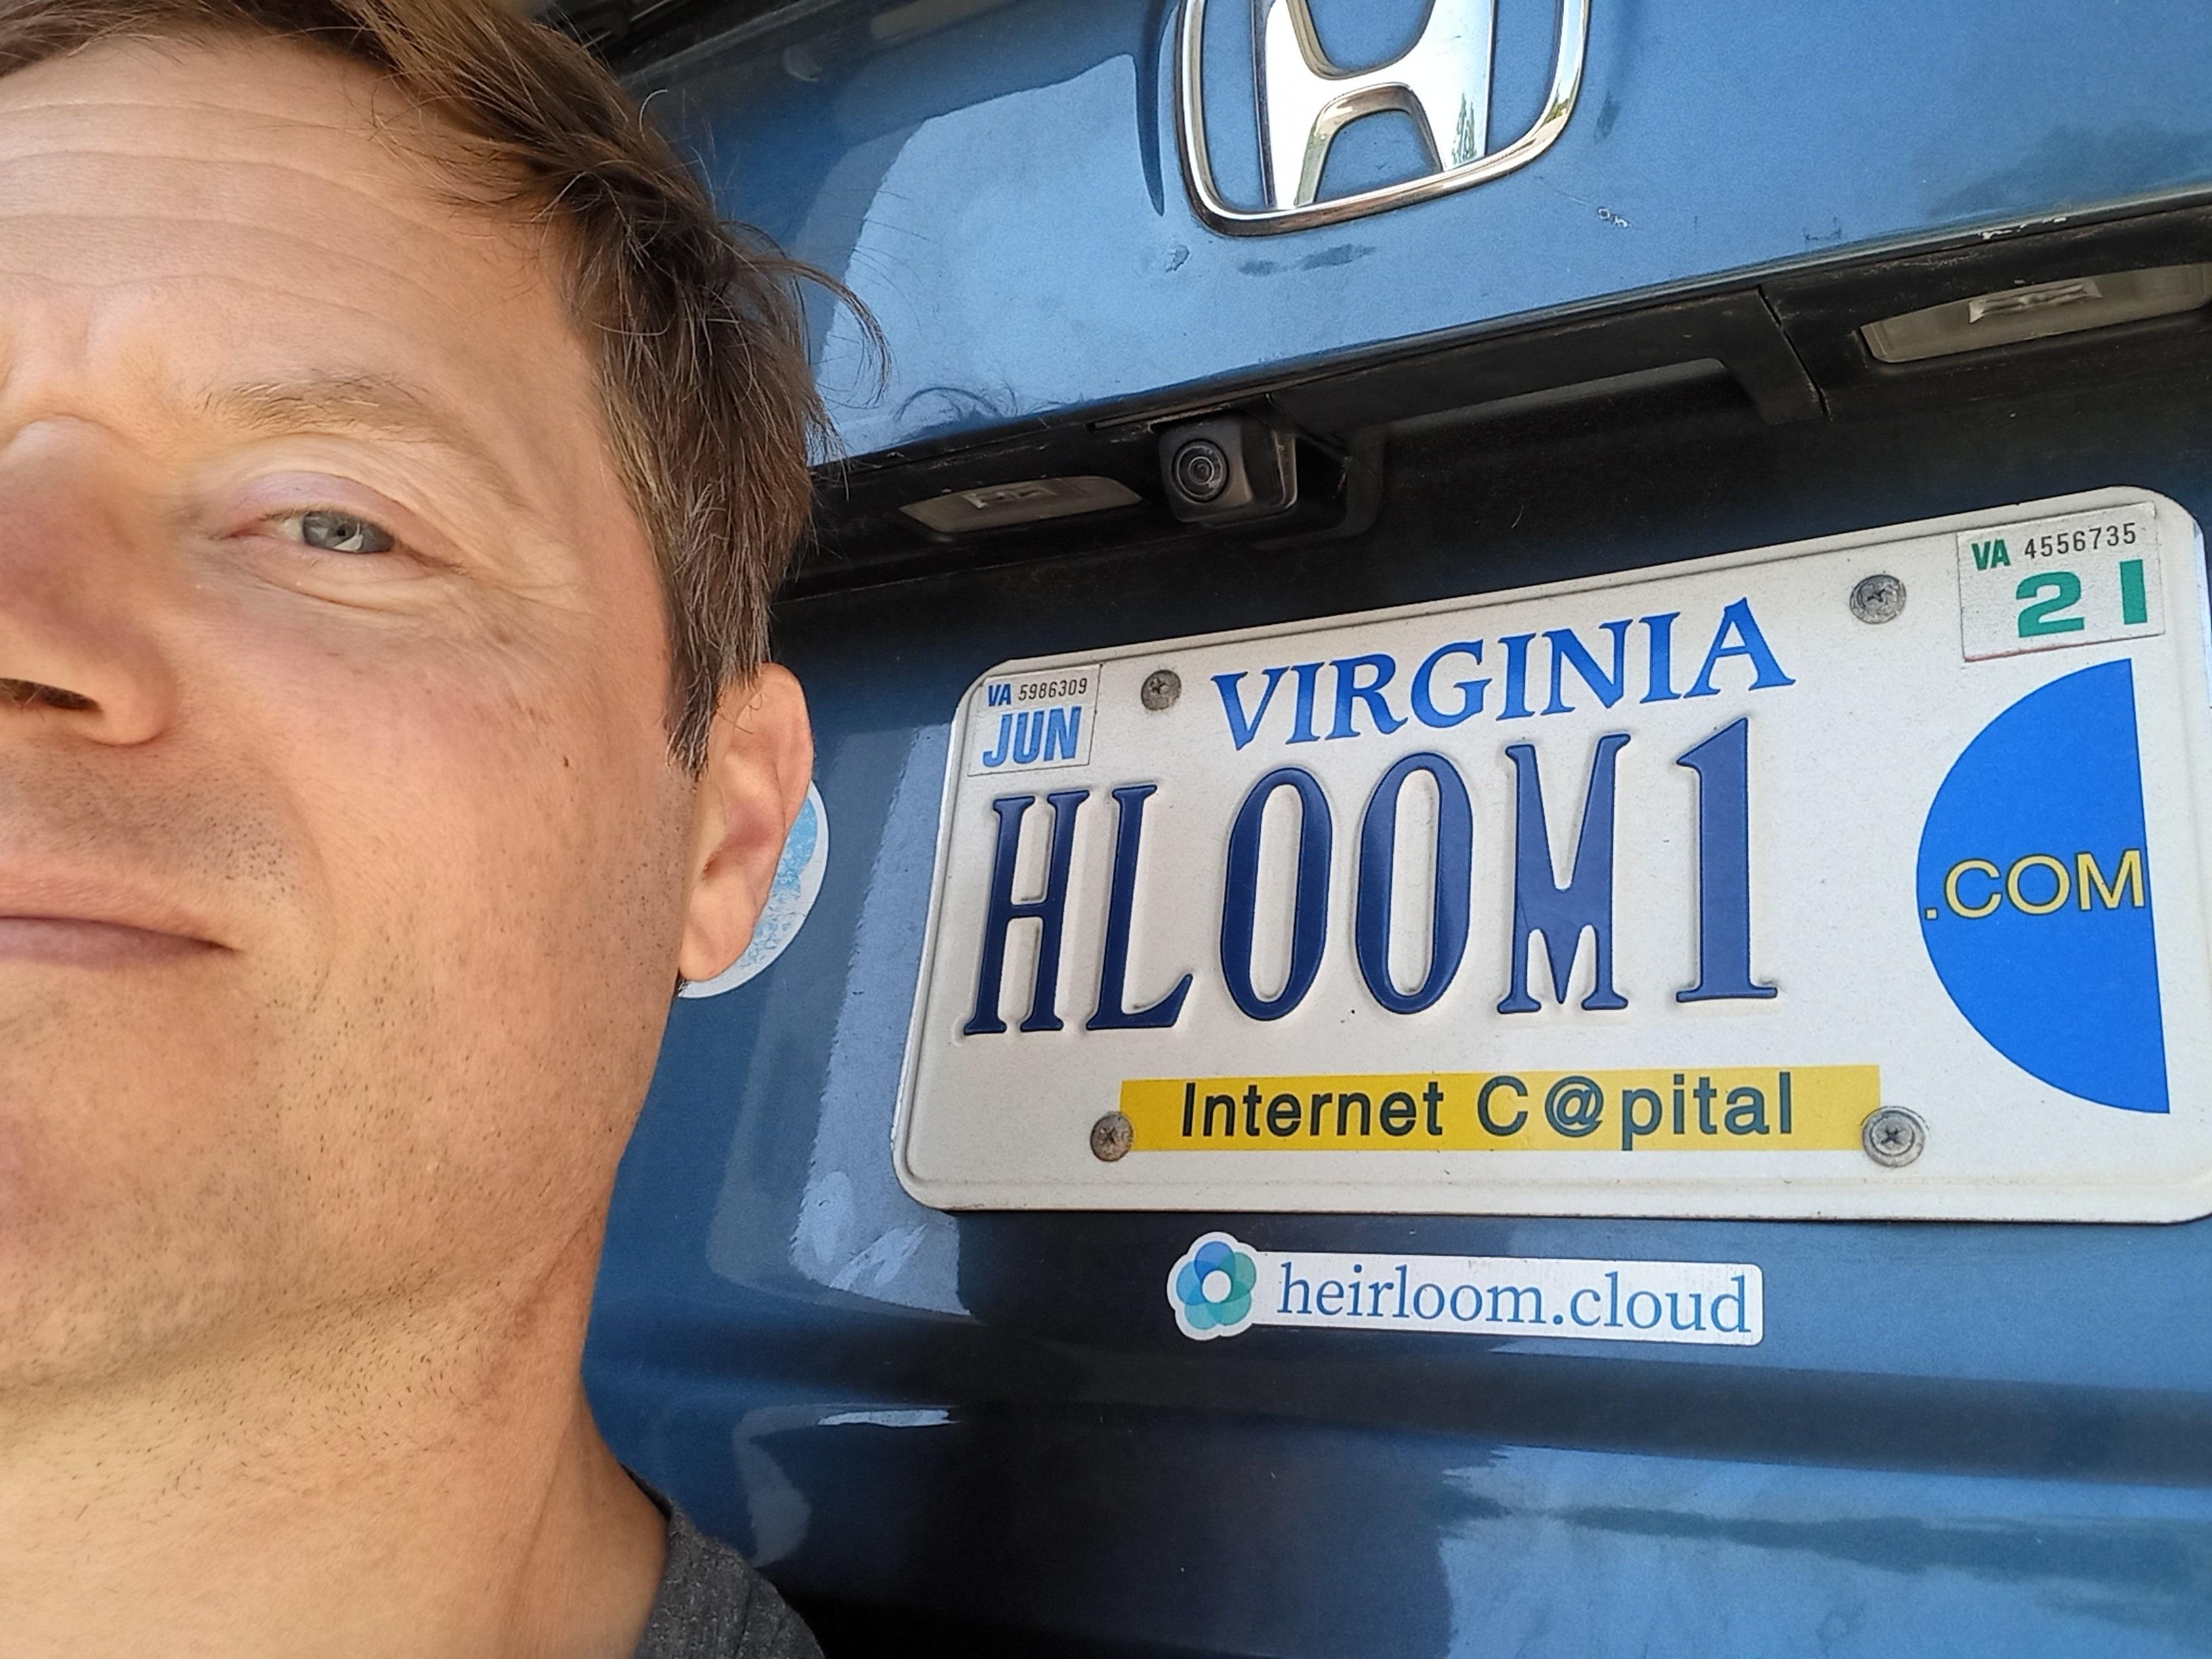 Geoff Weber, CEO of Heirloom Cloud